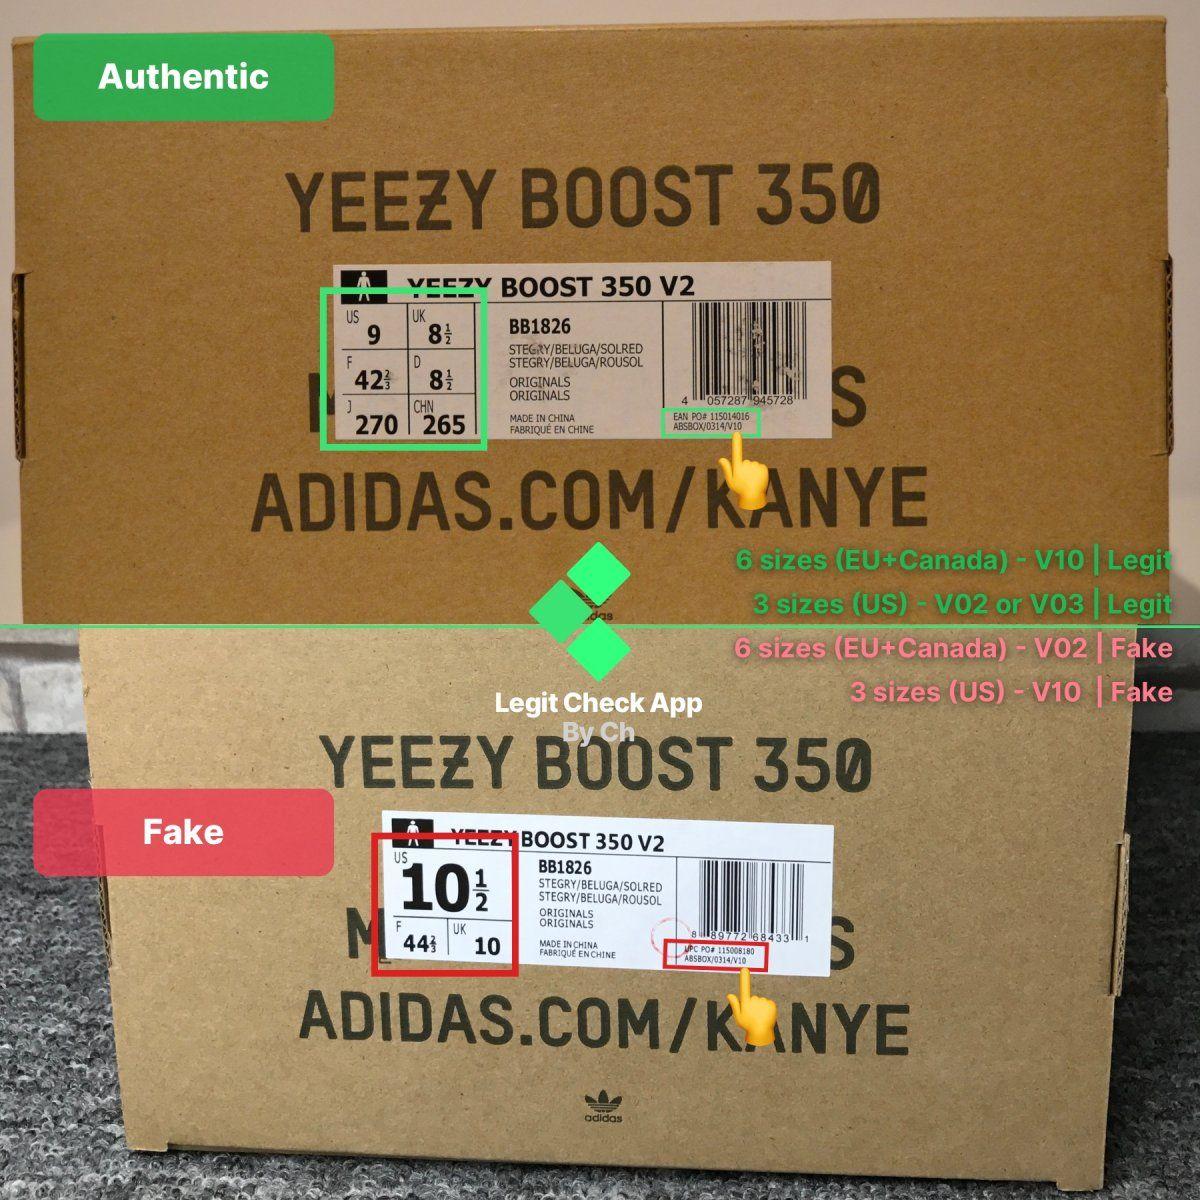 Real vs fake Yeezy Boost 350 V2 box